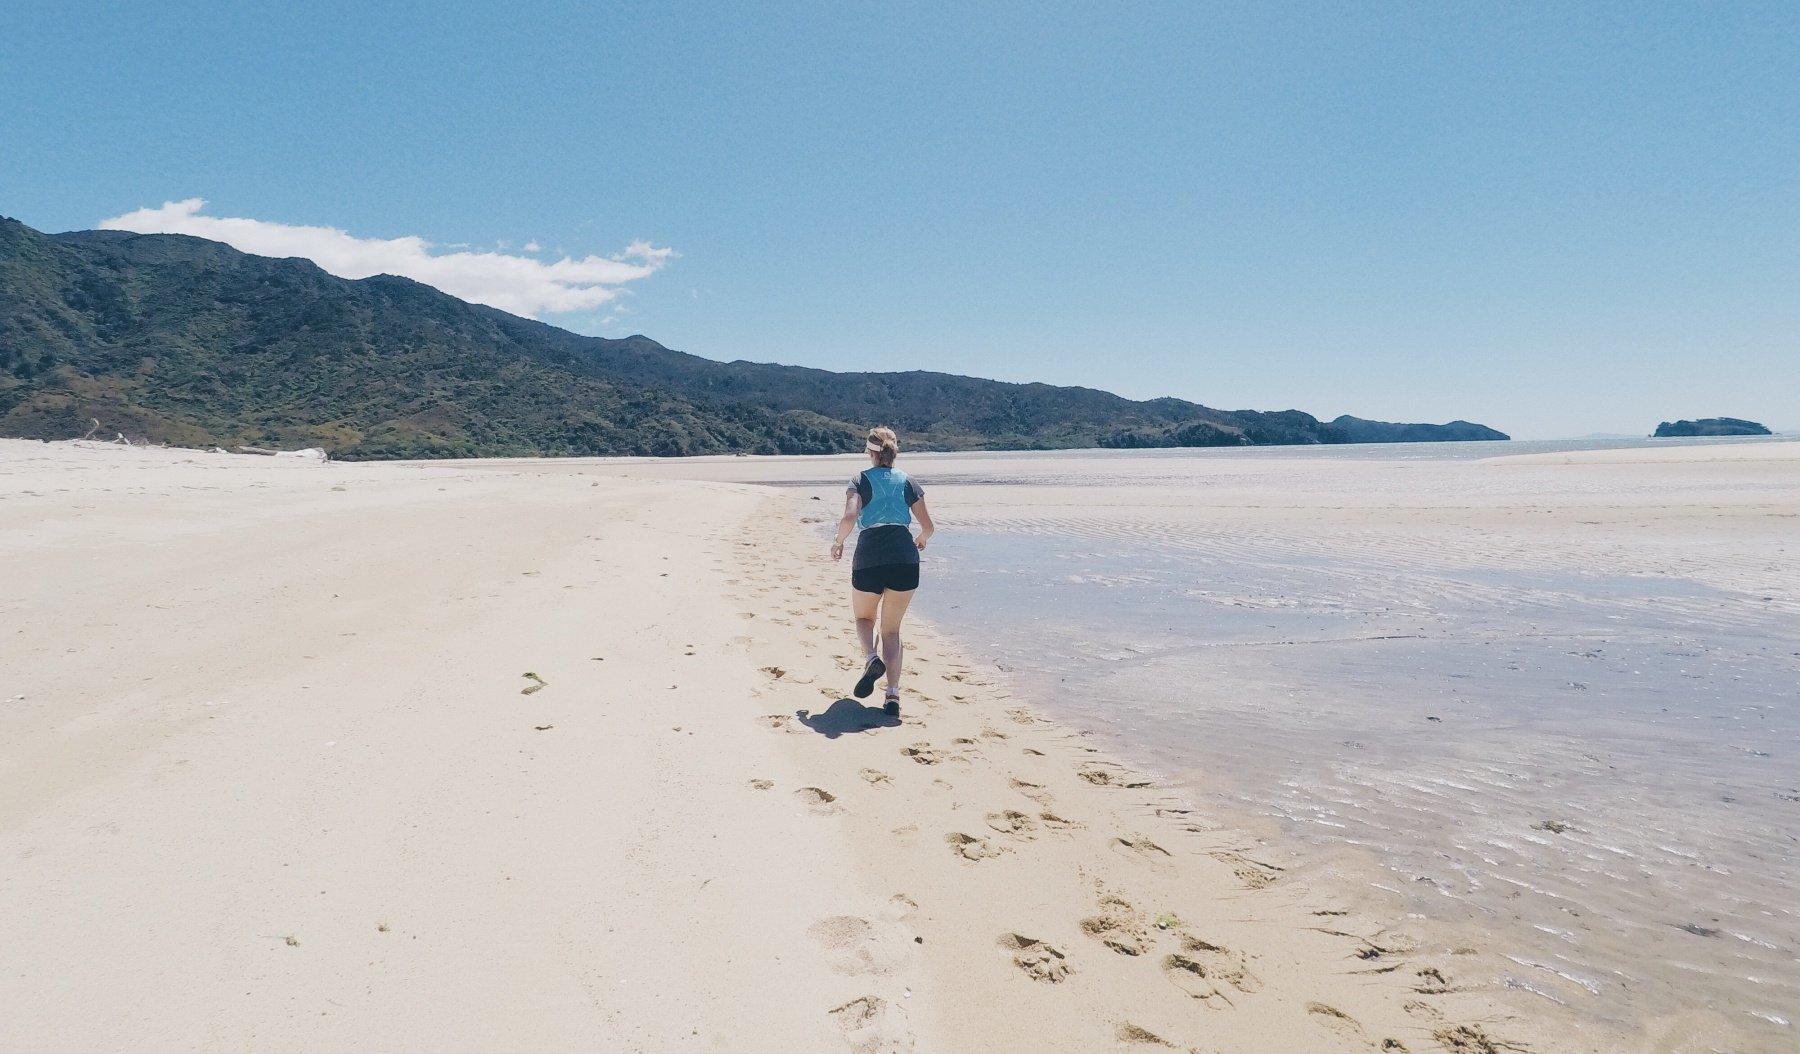 Trail running Abel Tasman National Park beach